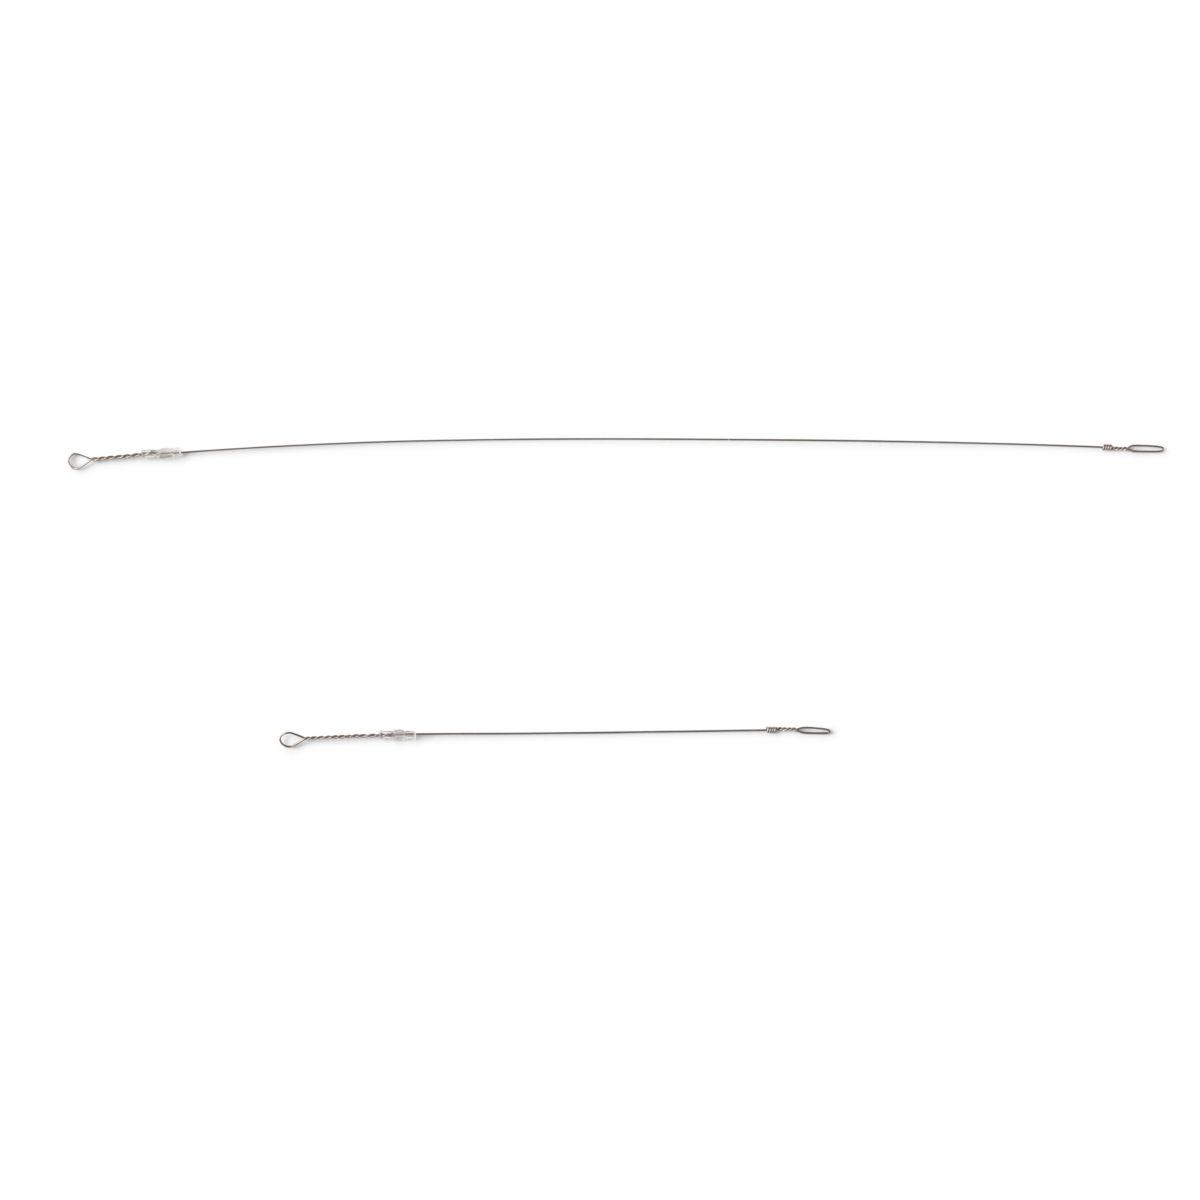 Retwistable Haywire Bite Guards - 4